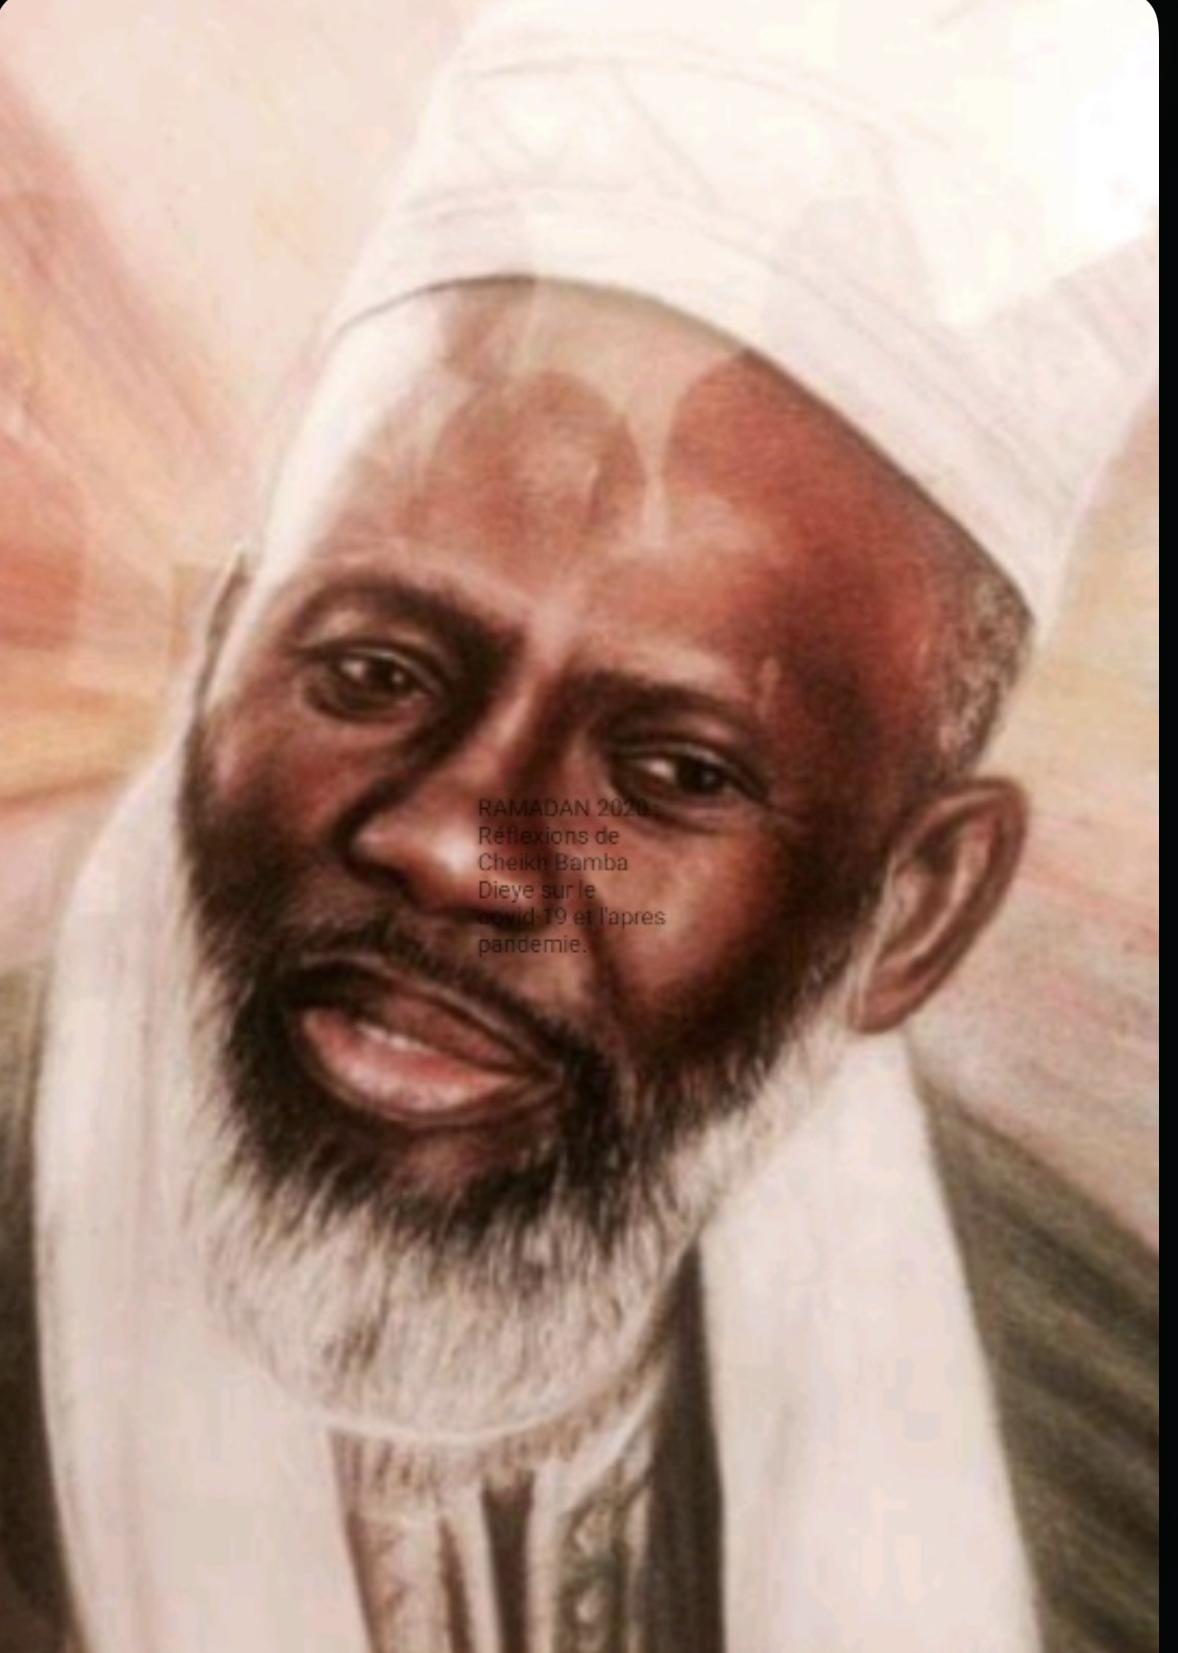 Cheikh Abdoulaye Dieye , 27 mars 2002 - 19 années déjà. (Par Cheikh Bamba Dieye)